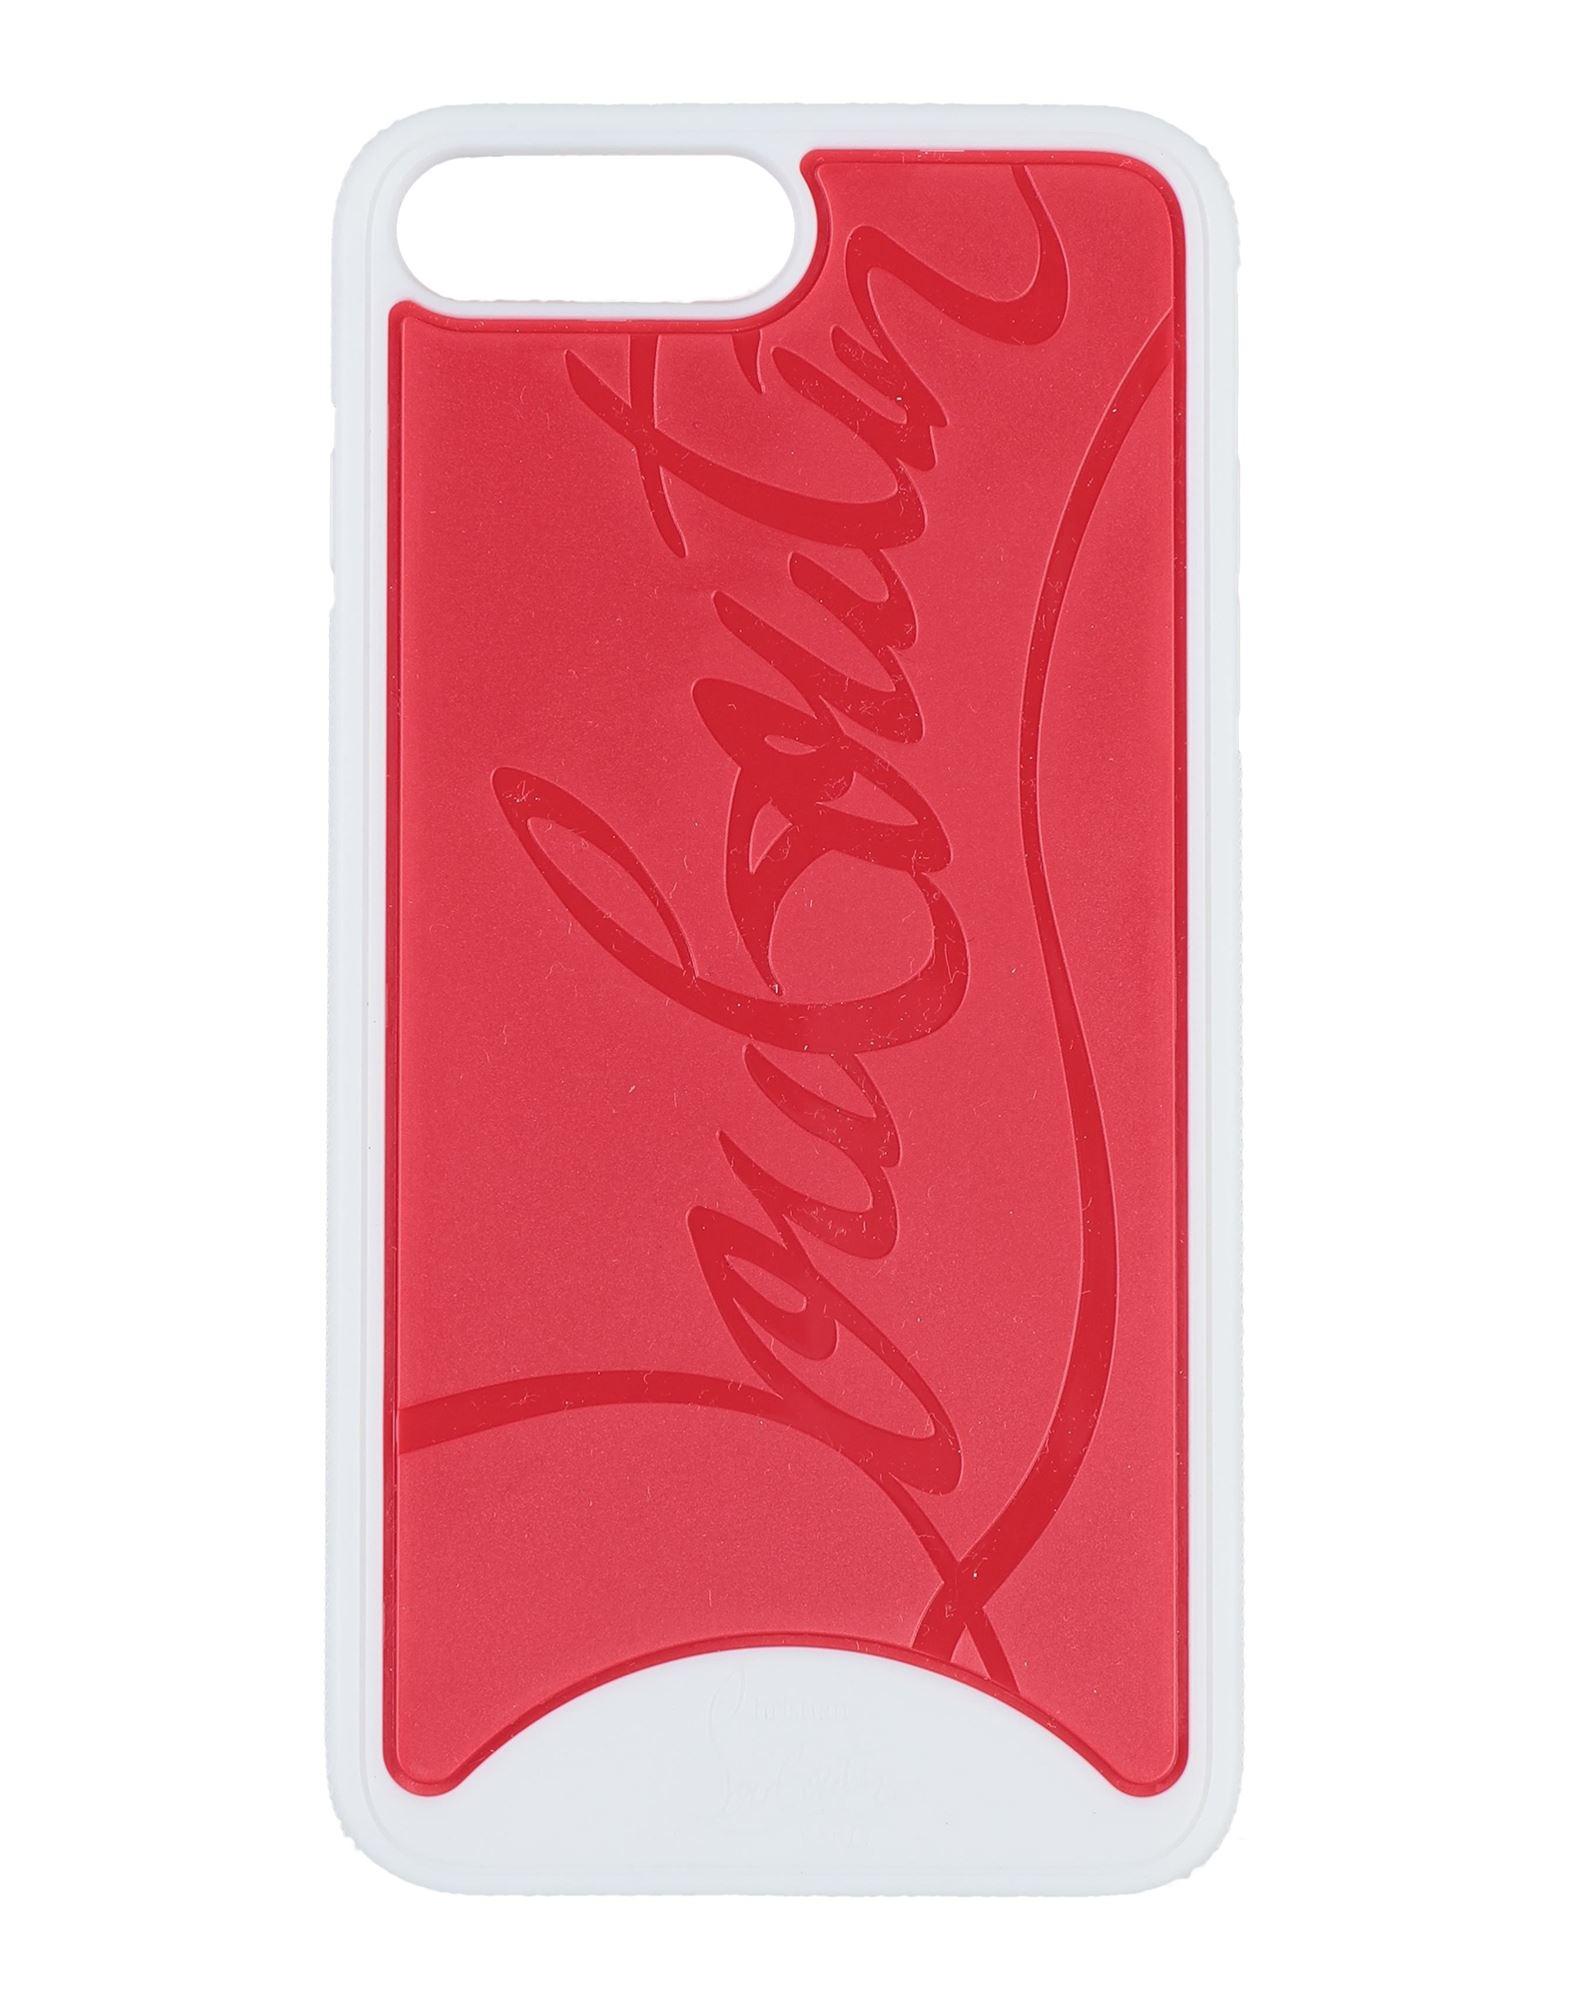 Фото - CHRISTIAN LOUBOUTIN Чехол deppa fifa логотип чехол для apple iphone 7 8 plus red